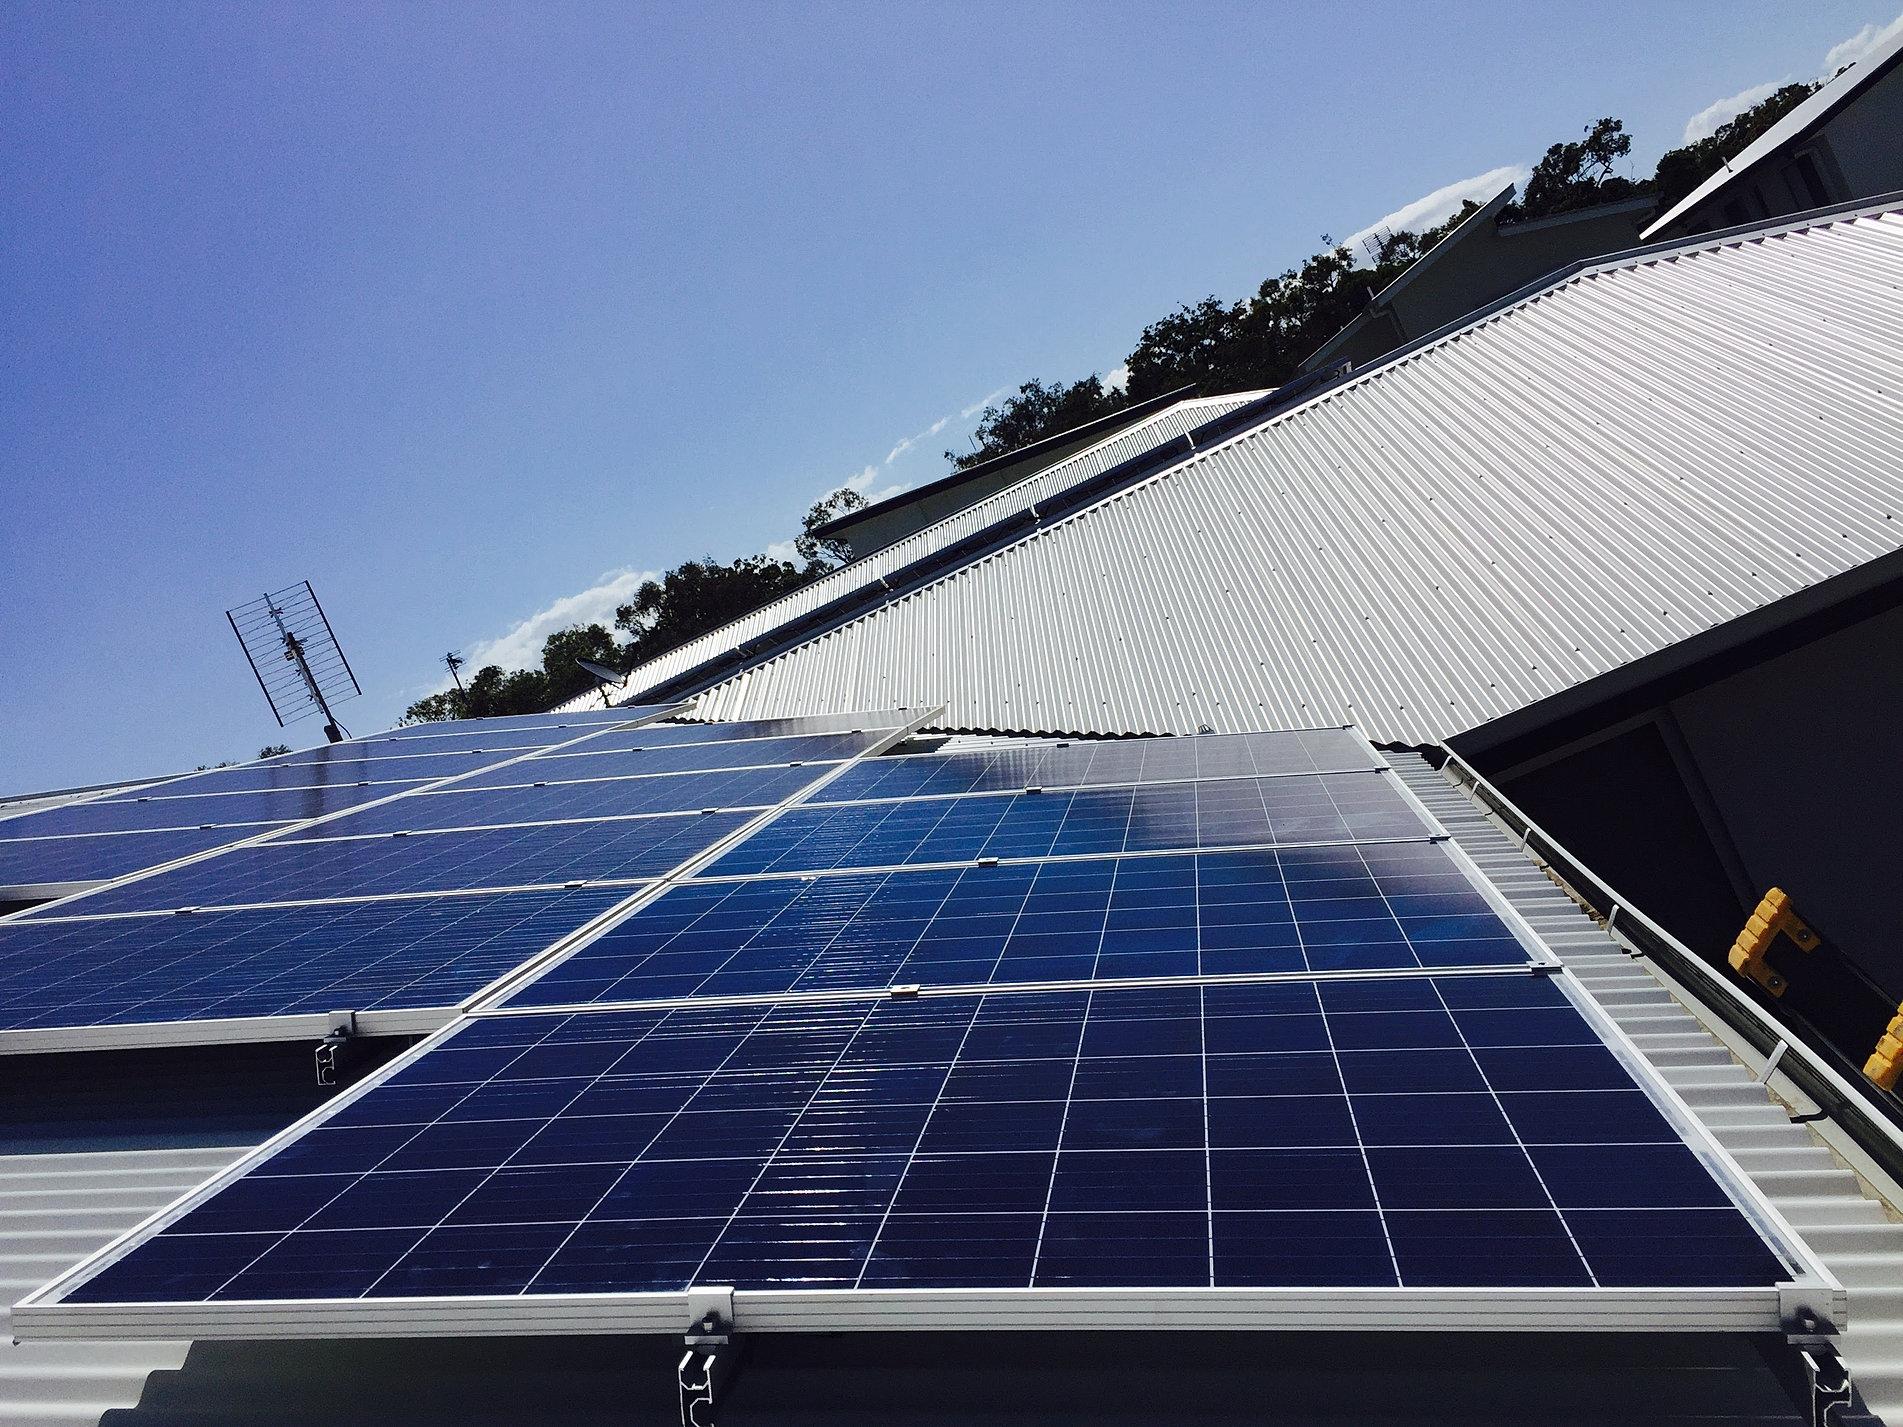 Sunsmart Solar Panels Airconditioning And Solar Heating